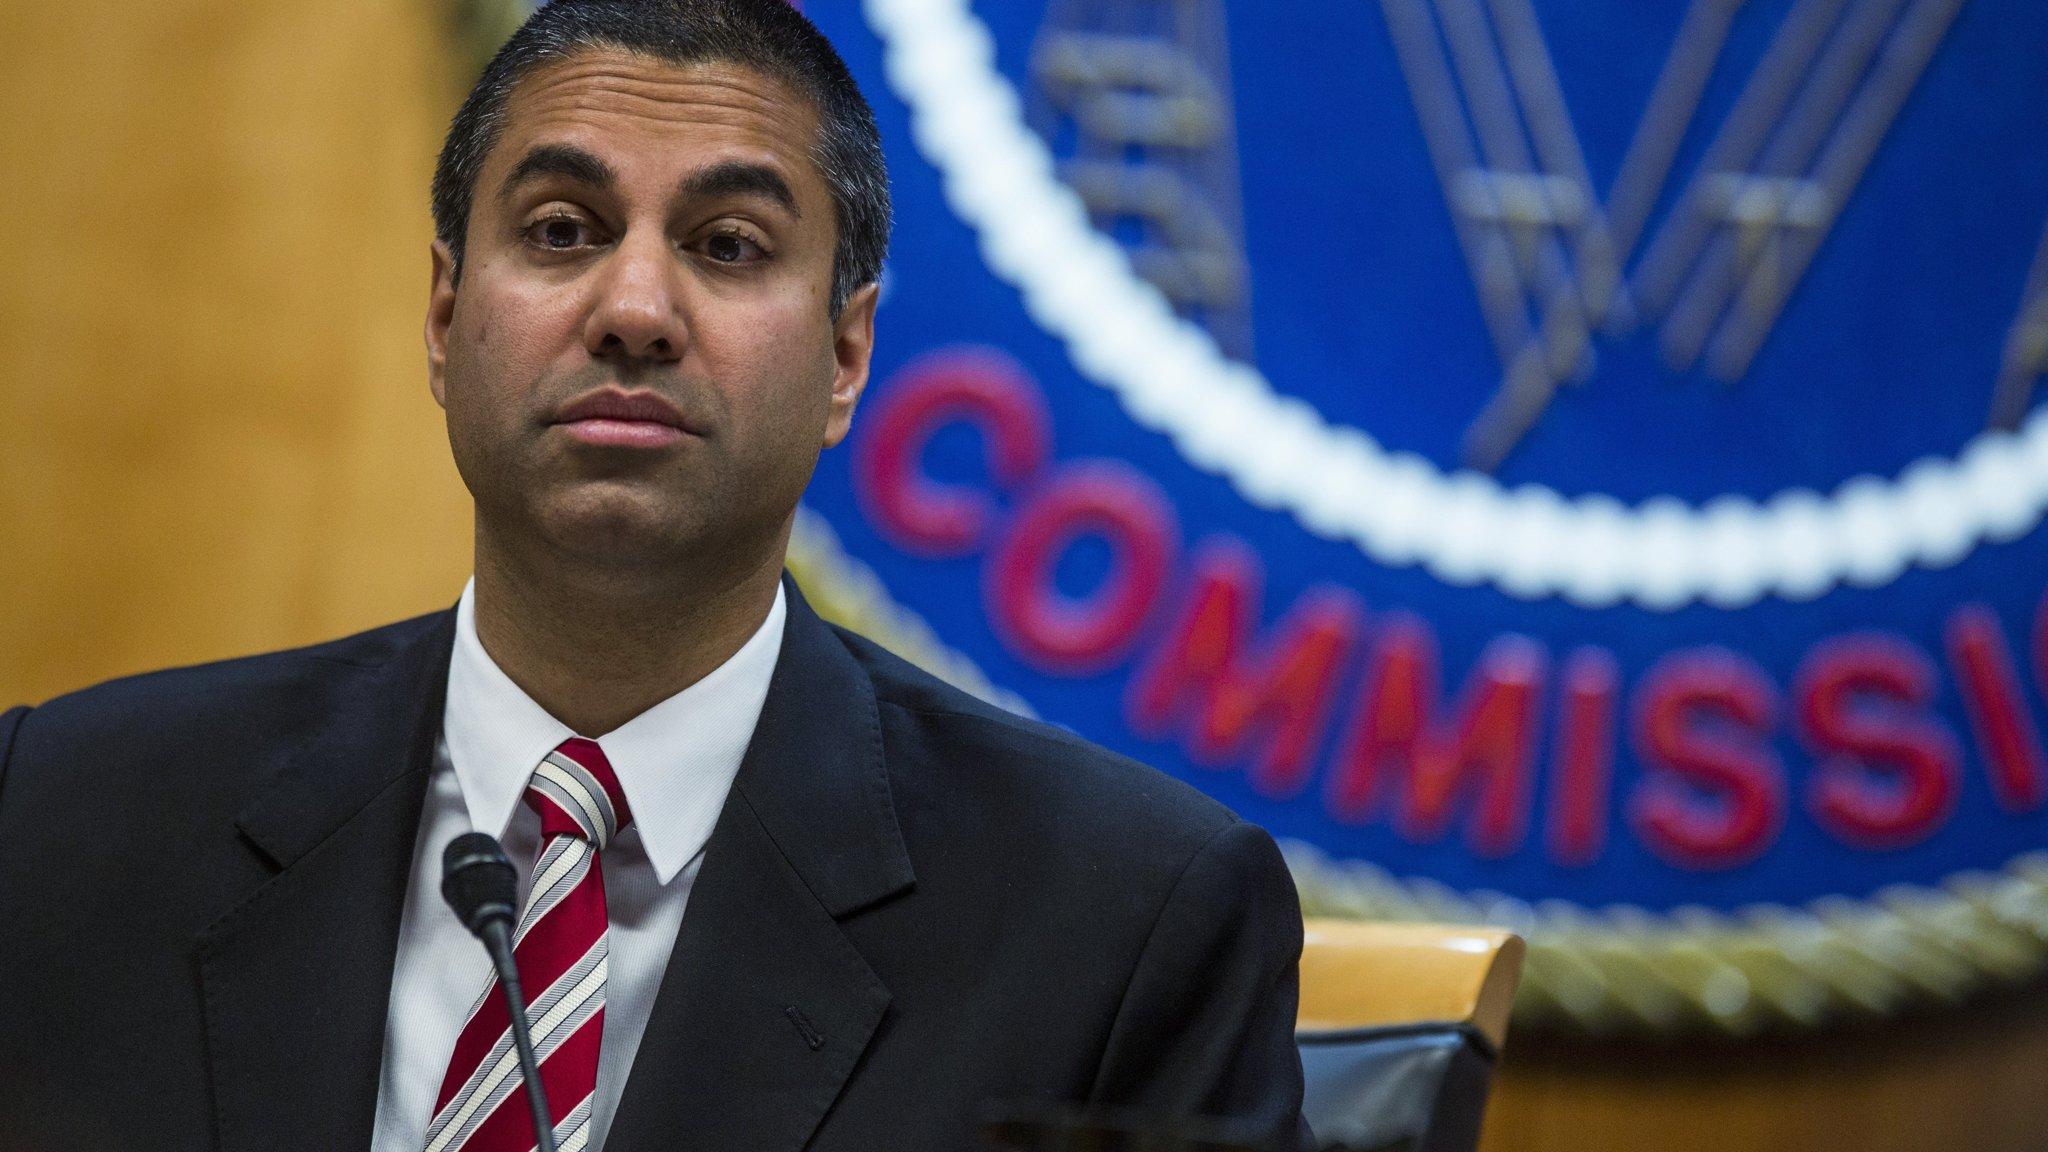 Trump administration plans to scrap net neutrality